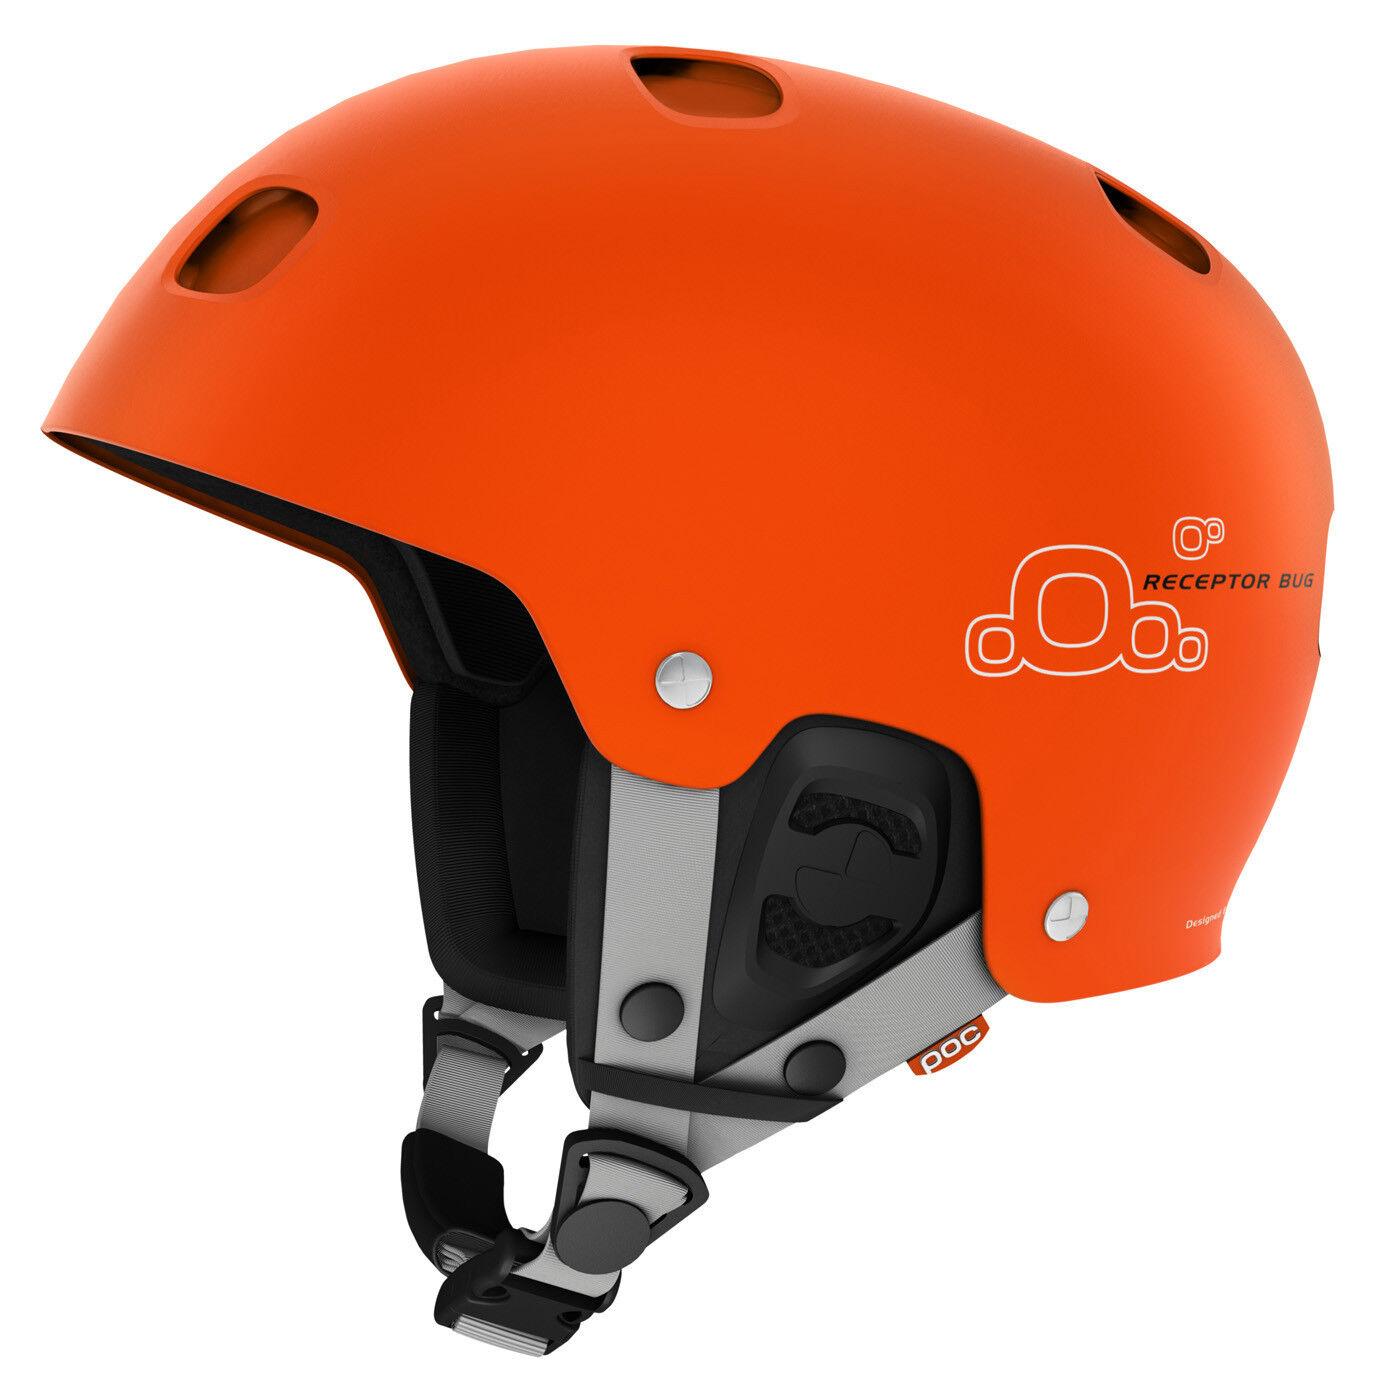 POC Receptor Receptor Receptor Bug esquí Esquí Nieve Para Adulto Casco Naranja De Hierro Grande L 57 58 Cm 66e09f